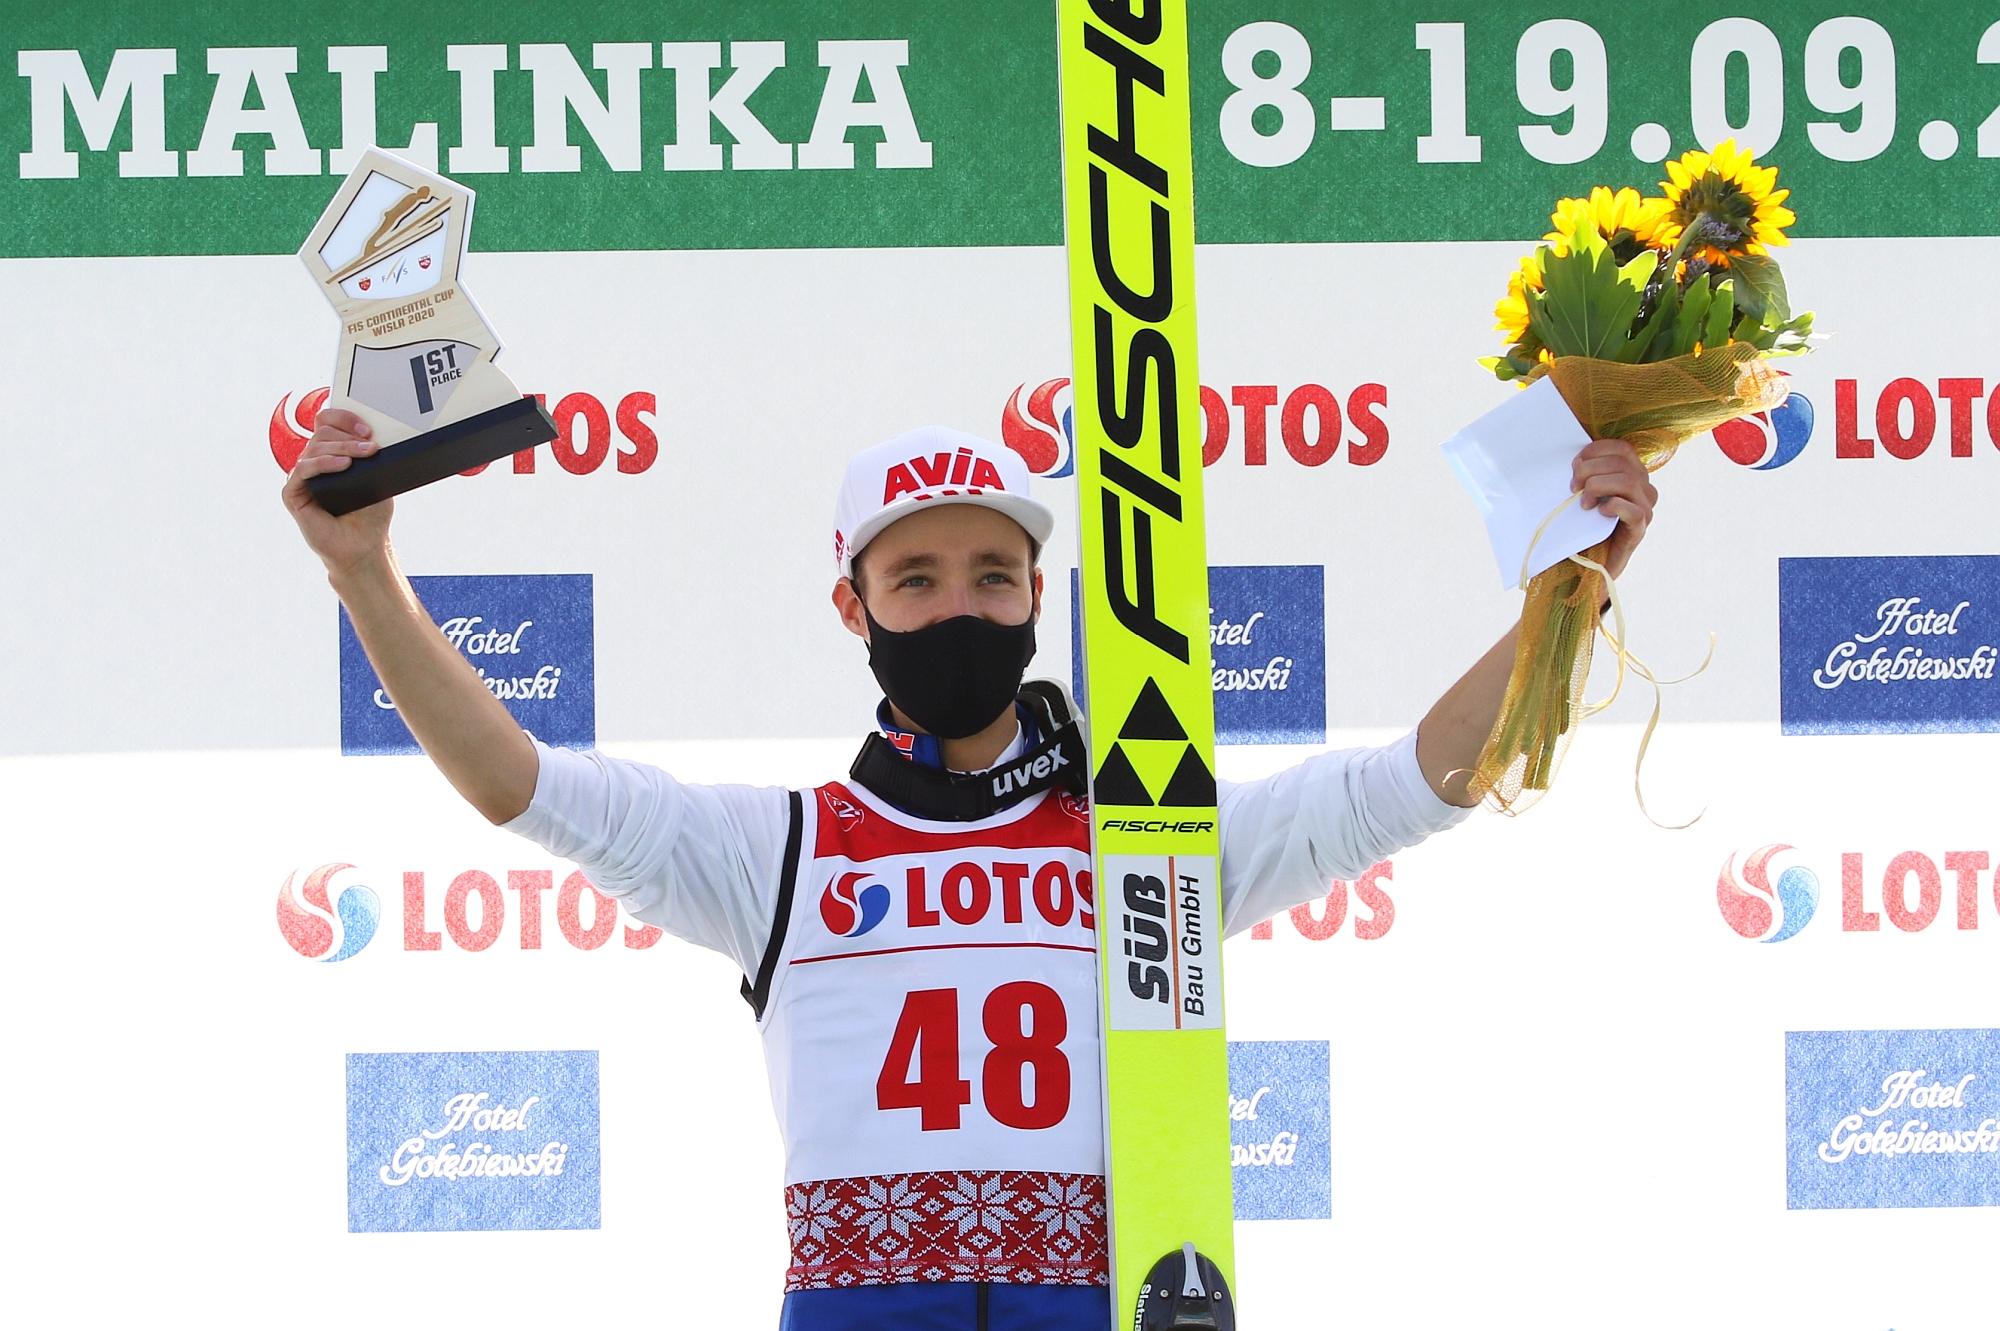 MartinHamann Wisla2020winner fot.JuliaPiatkowska2 - Letni Puchar Kontynentalny